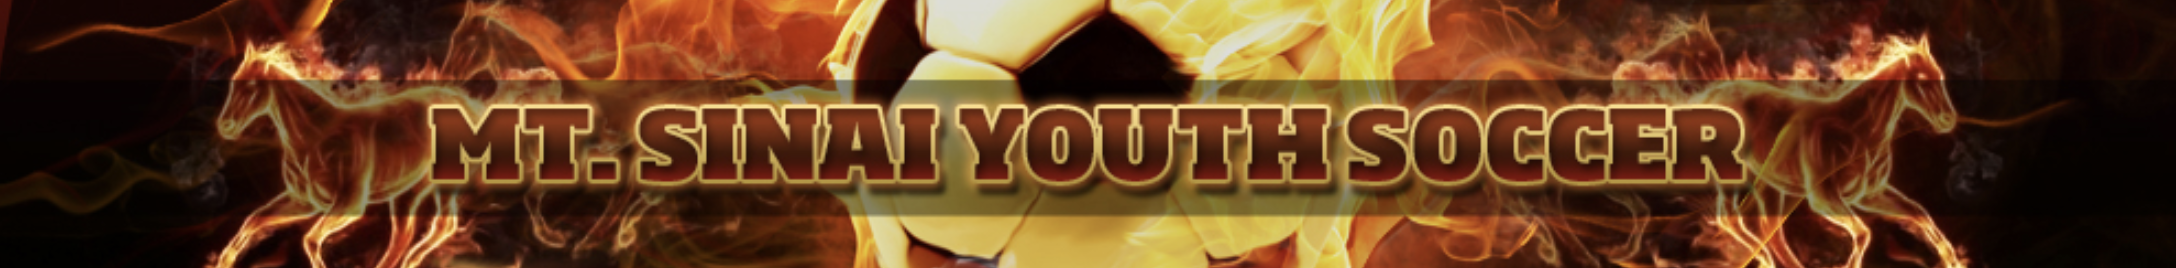 Msys banner